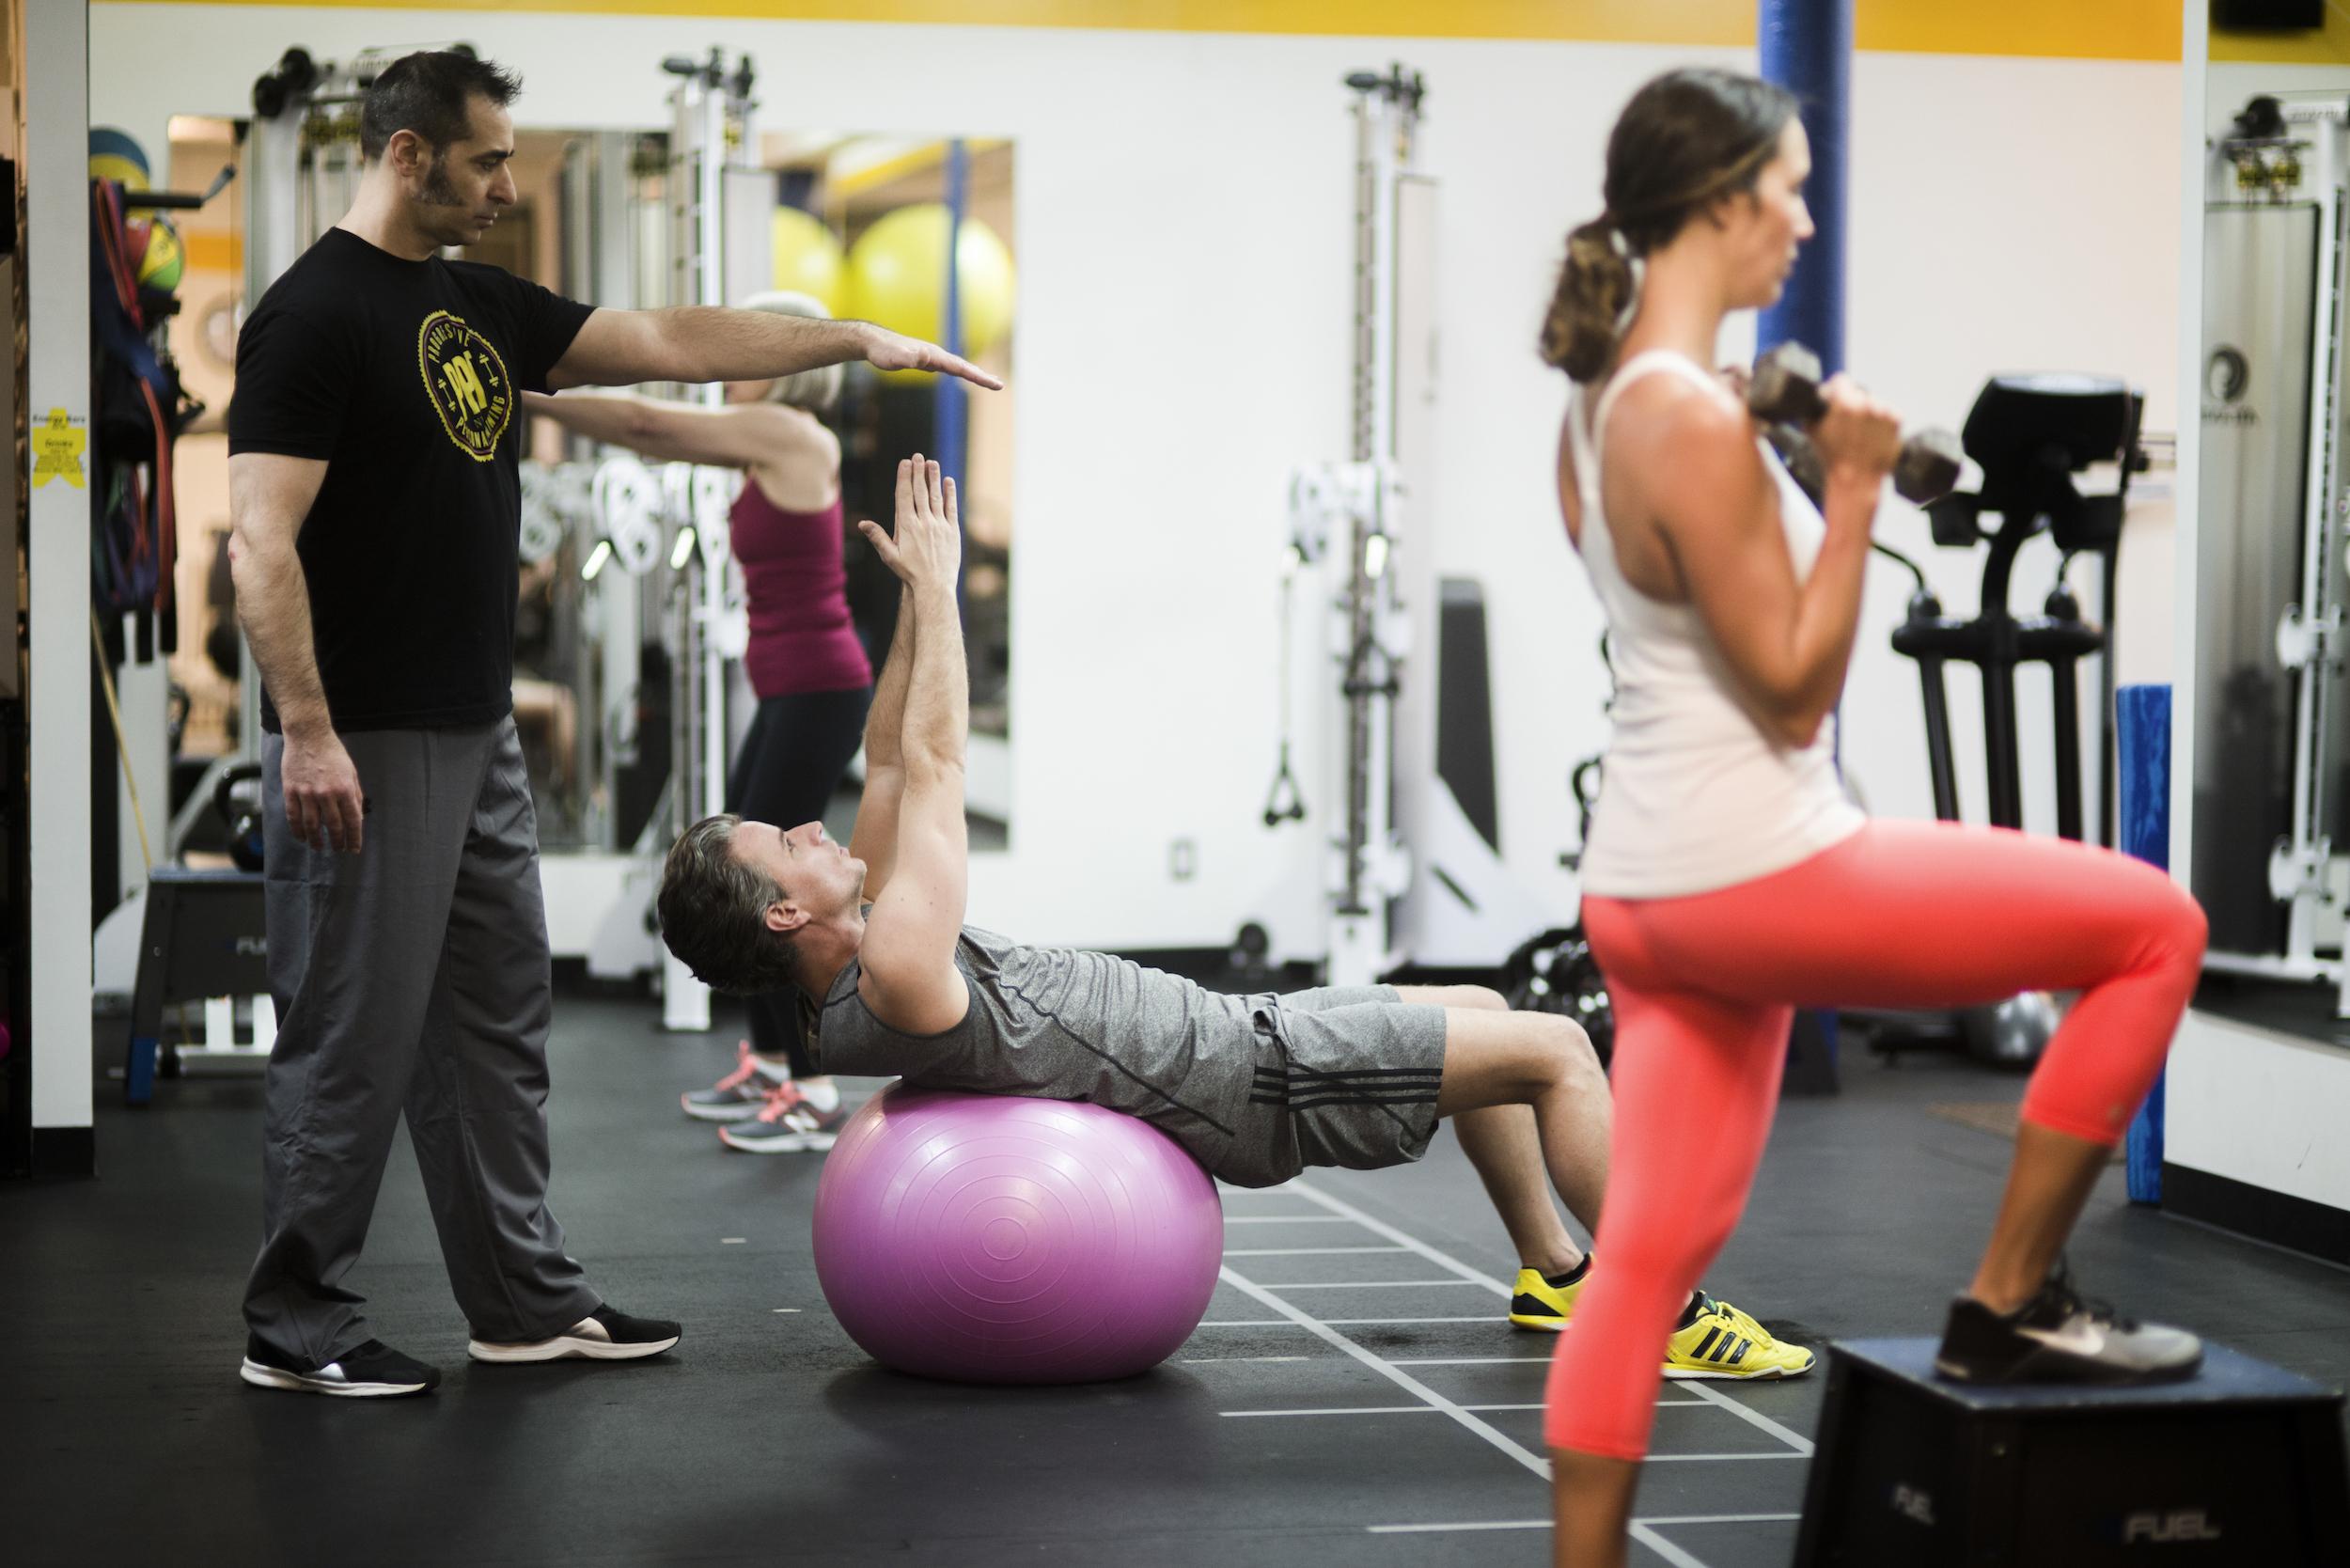 progressive personal training, progressivepersonaltraining.com, pptchelsea.com, personal trainer new york city, personal trainer Chelsea, Small Group Training, Personal Trainer 10011, online personal trainer